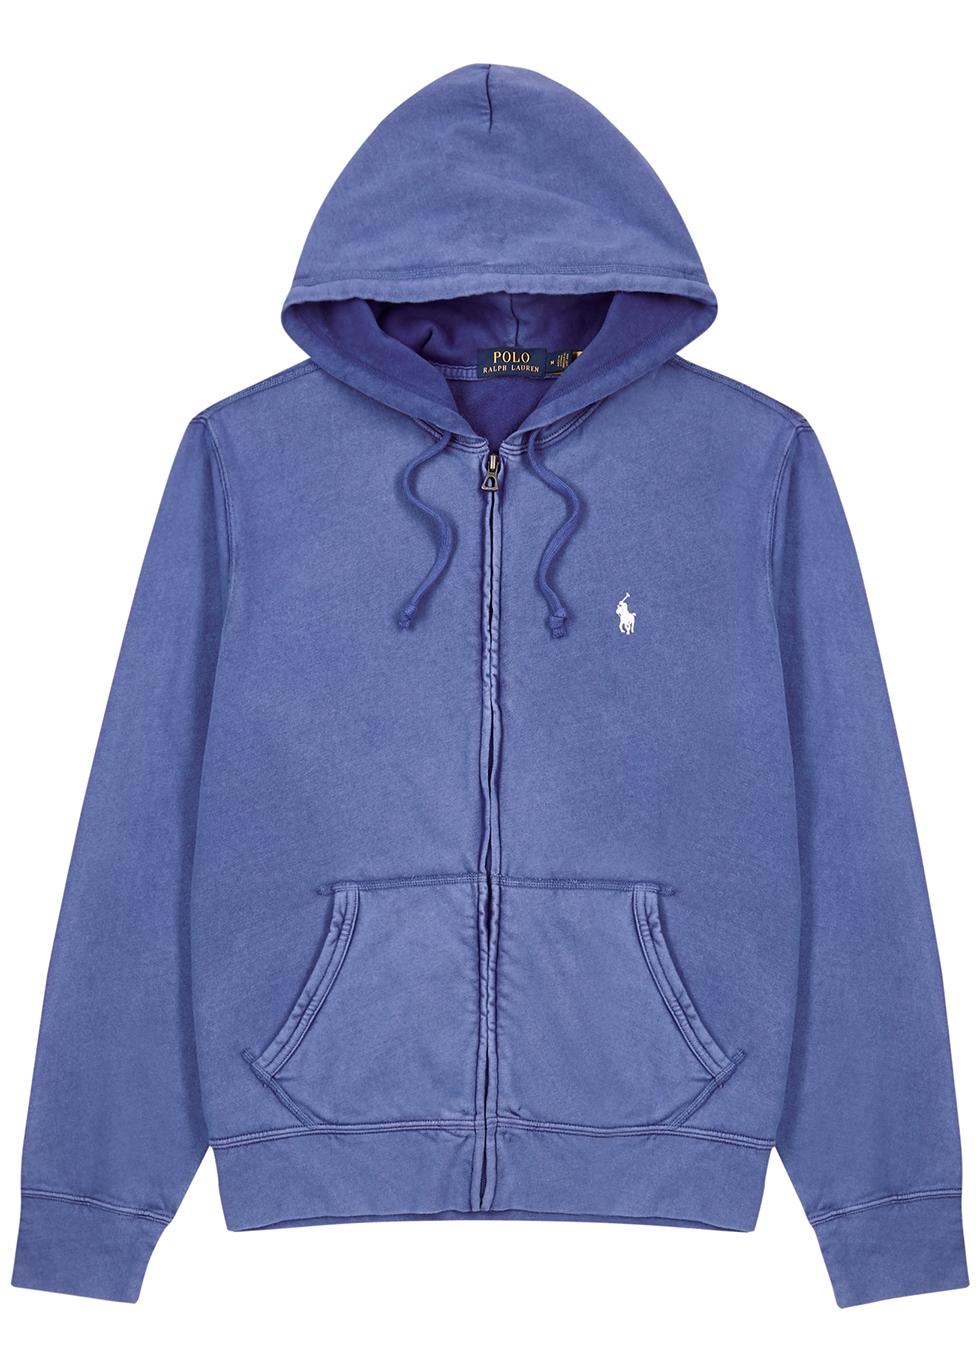 Blue hooded cotton sweatshirt